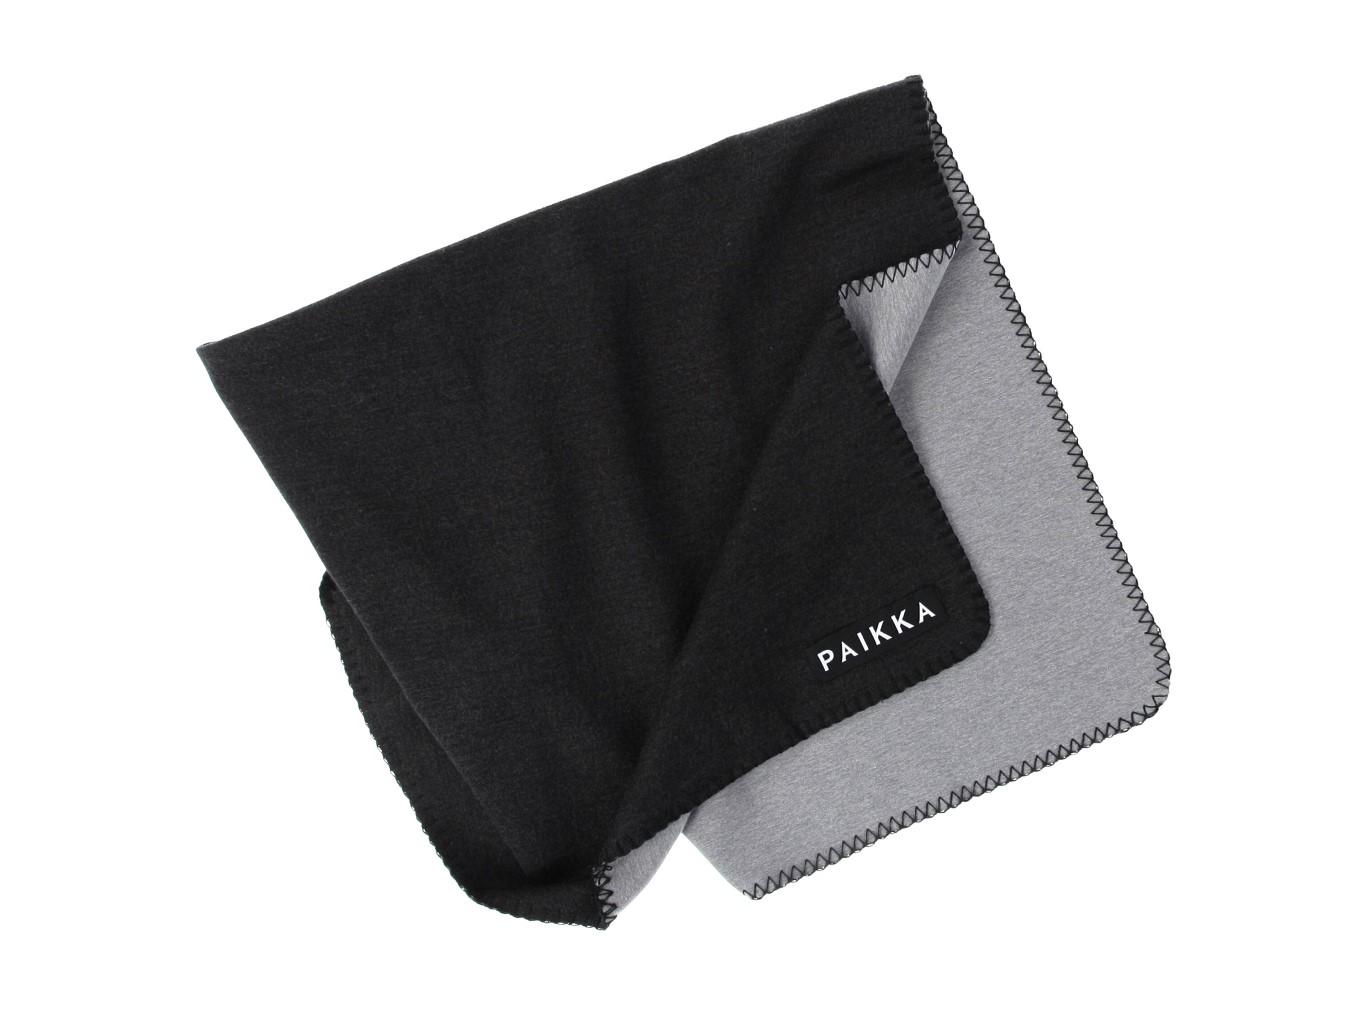 1028004_PAIKKA_Recovery_Blanket_grey_2